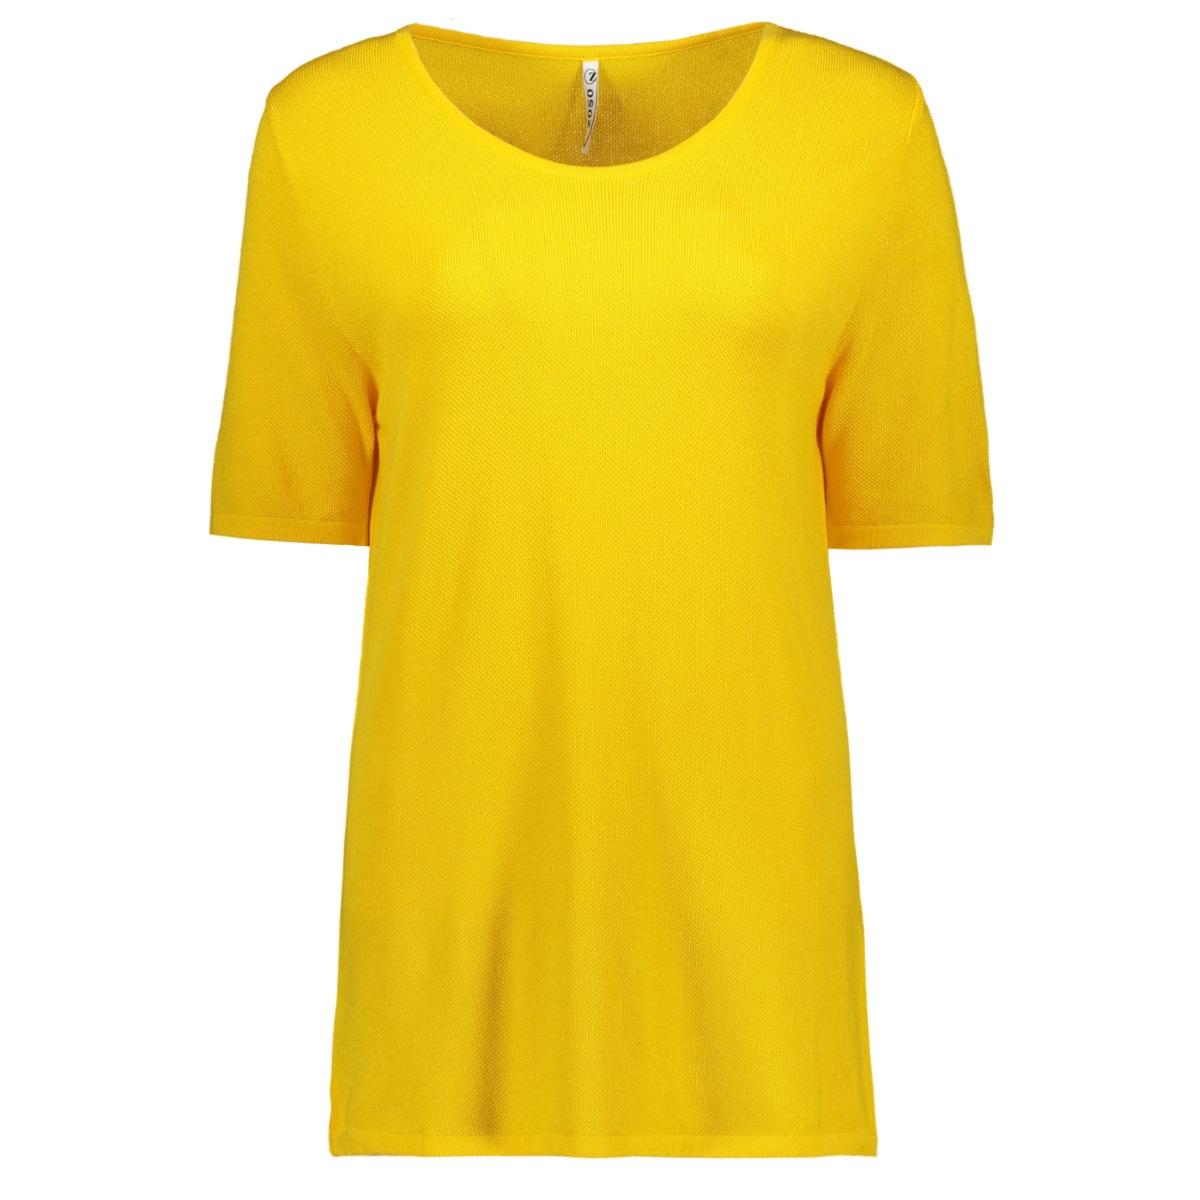 knitted top kn1911 zoso t-shirt yellow